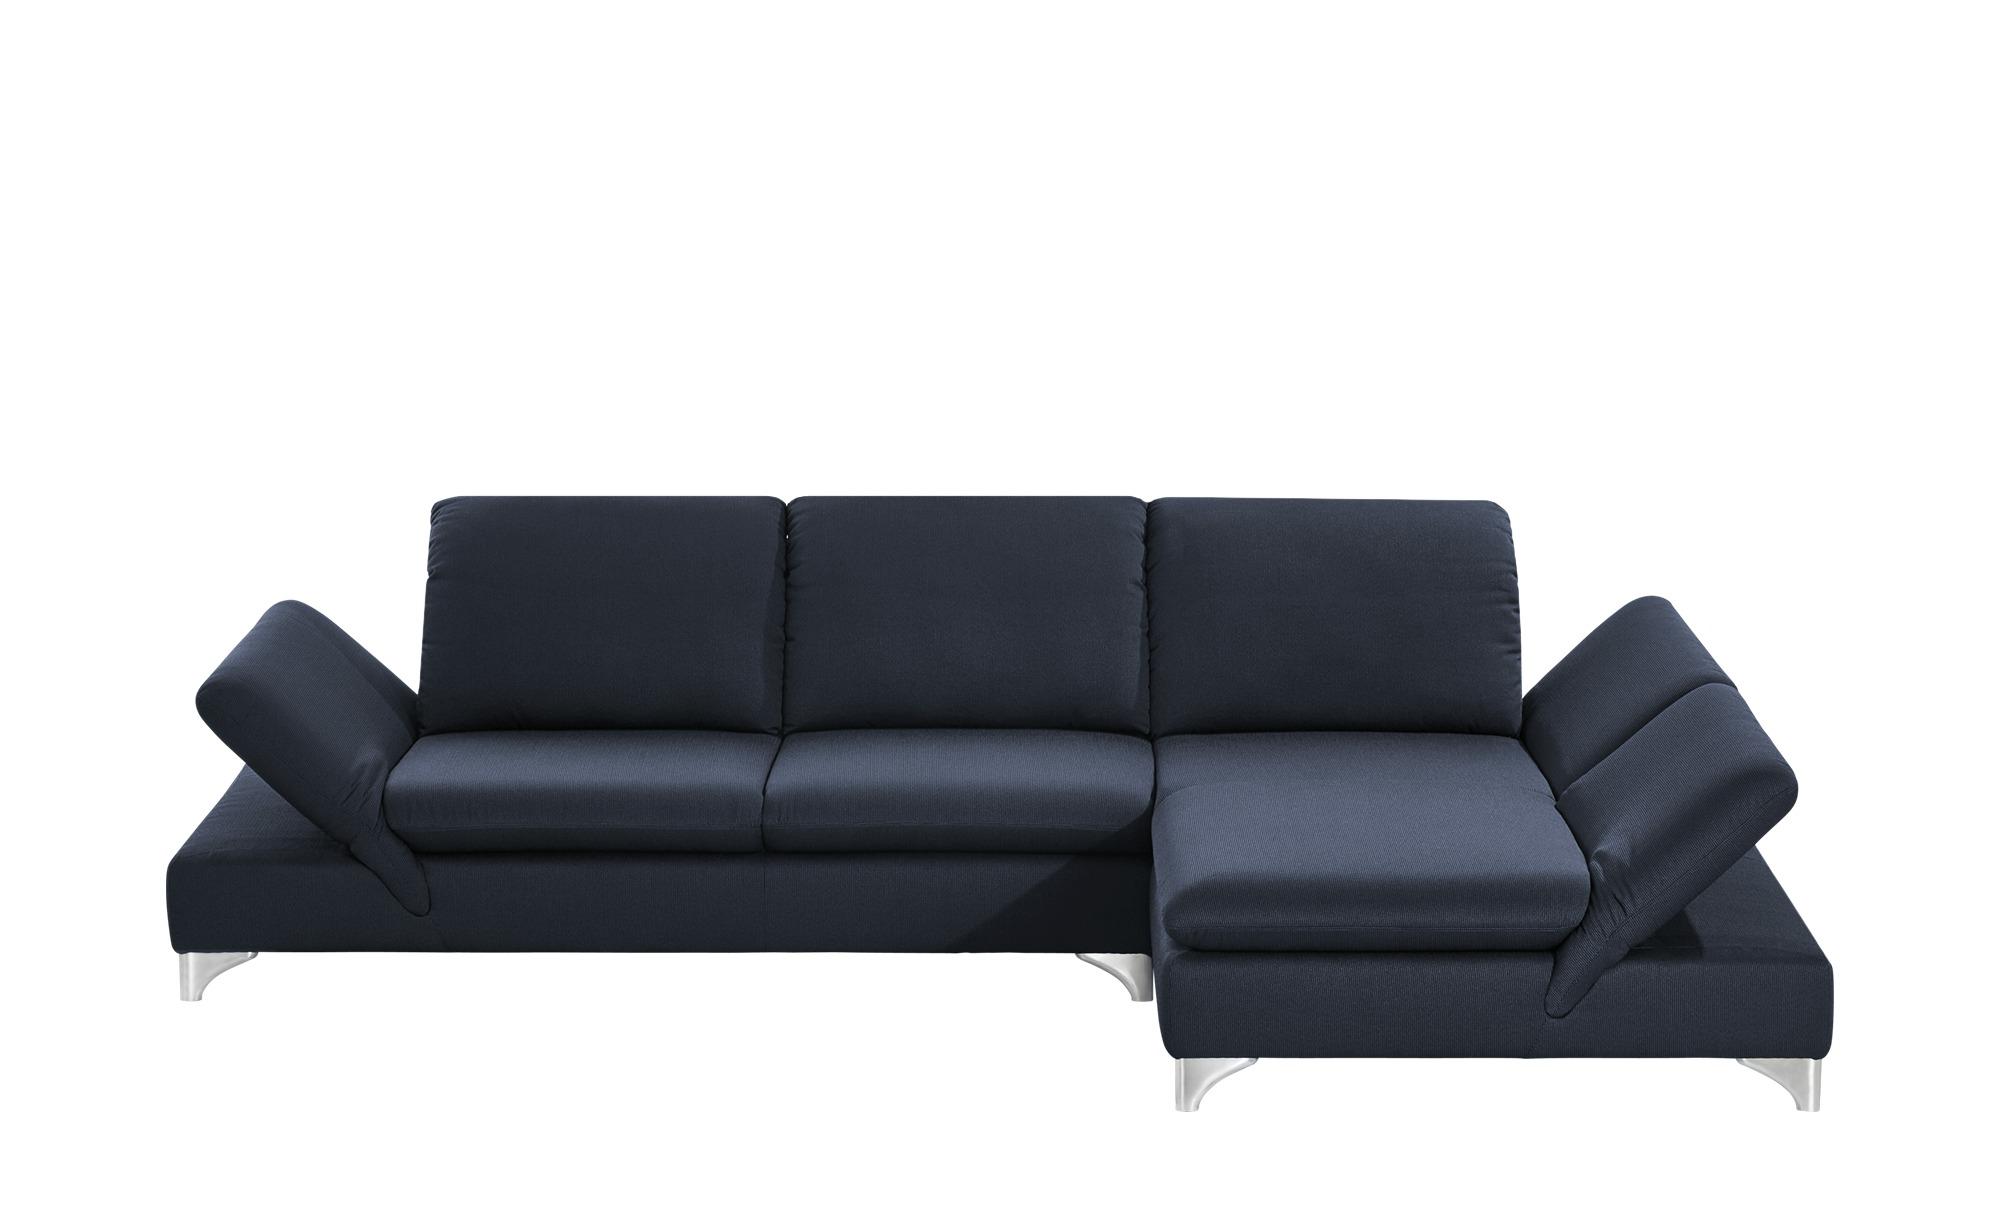 Full Size of Schillig Sofa Alexx Preis Taoo Ewald Kaufen Couch Sherry Online Gebraucht W Wschillig Ecksofa Blau Webstoff Saraa Dunkelblau Xora 3 Sitzer Kunstleder Weiß Sofa Schillig Sofa